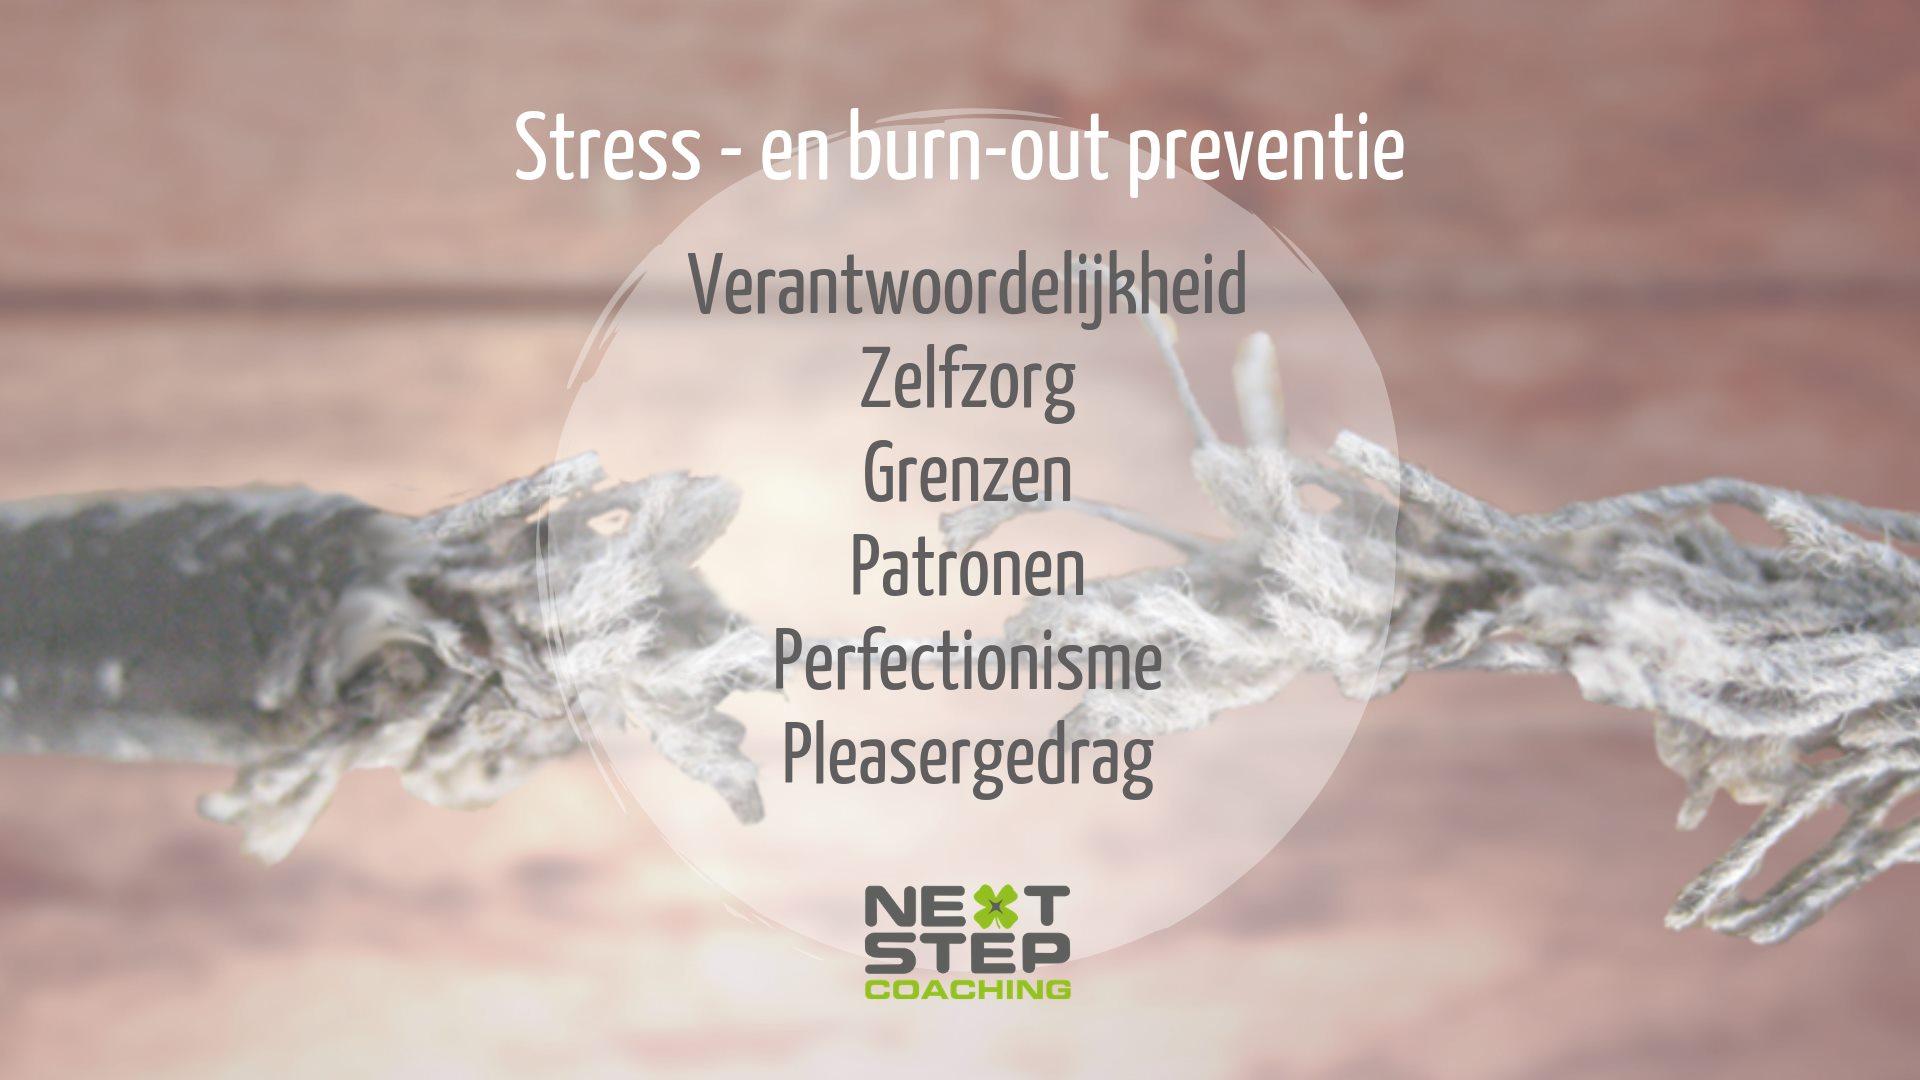 PREVENTIE stress en burn-out